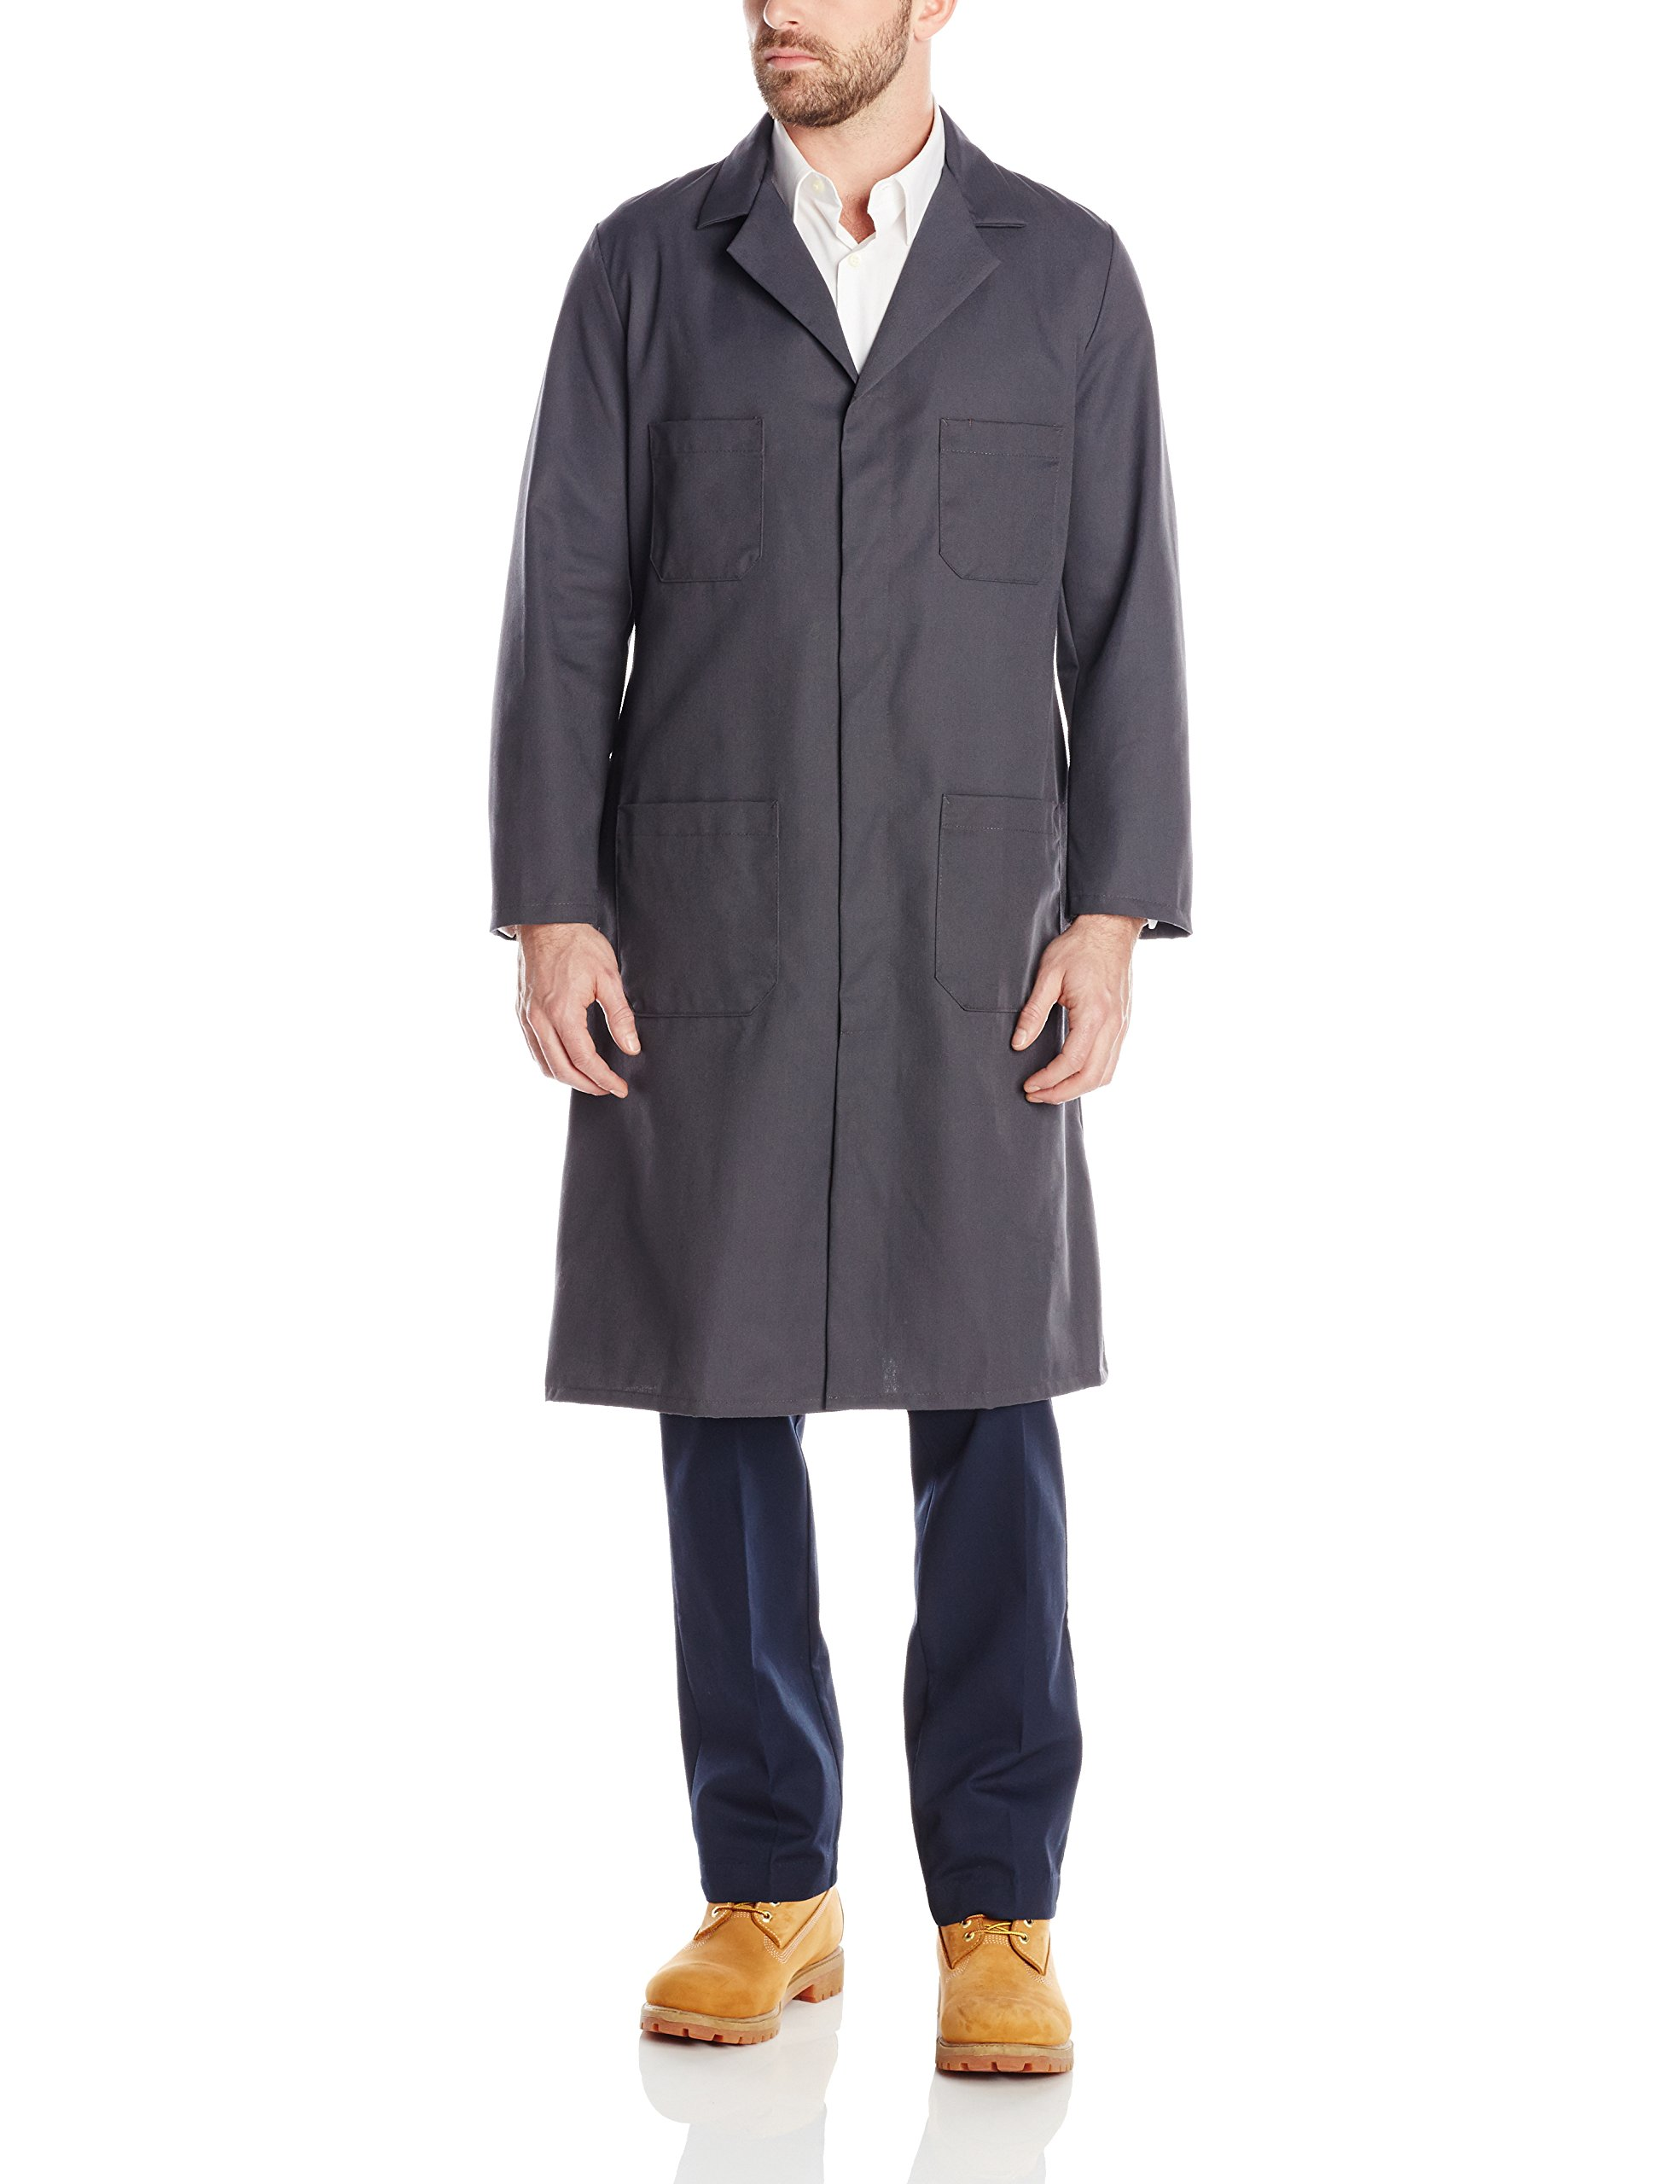 Red Kap Men's Shop Coat, Charcoal, 48 by Red Kap